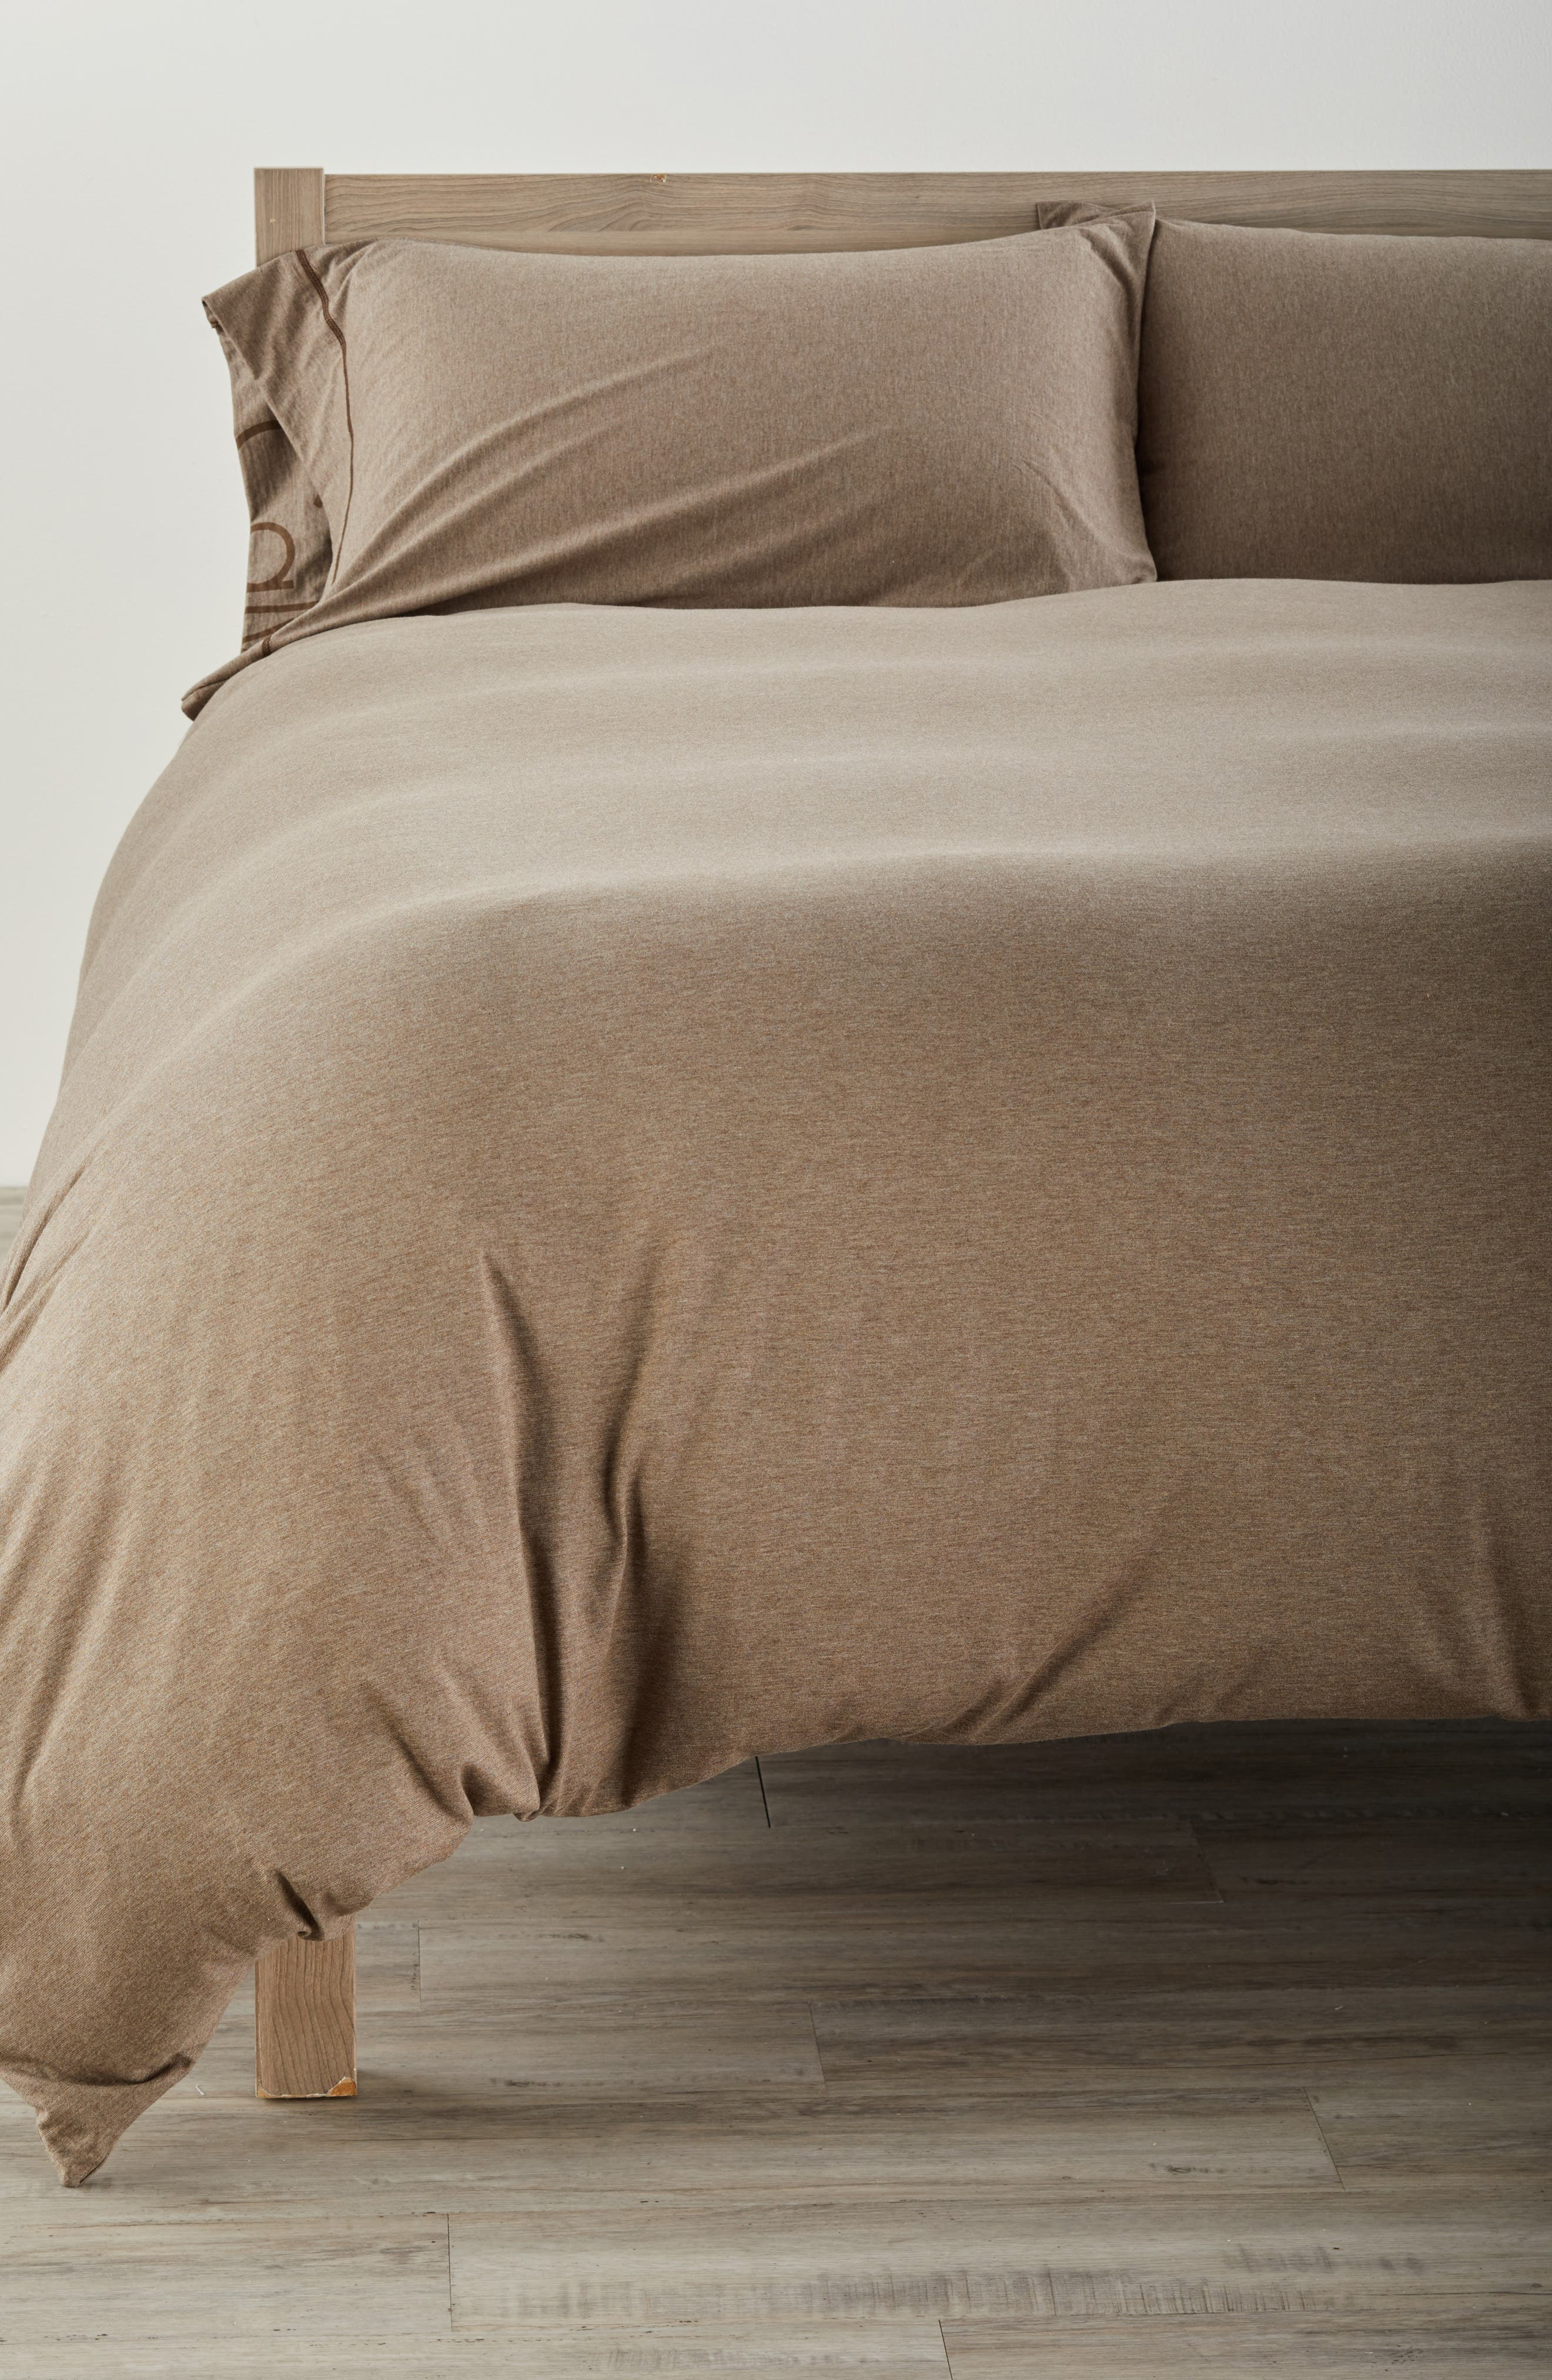 Cotton & Modal Jersey Duvet Cover,                         Main,                         color, Fawn